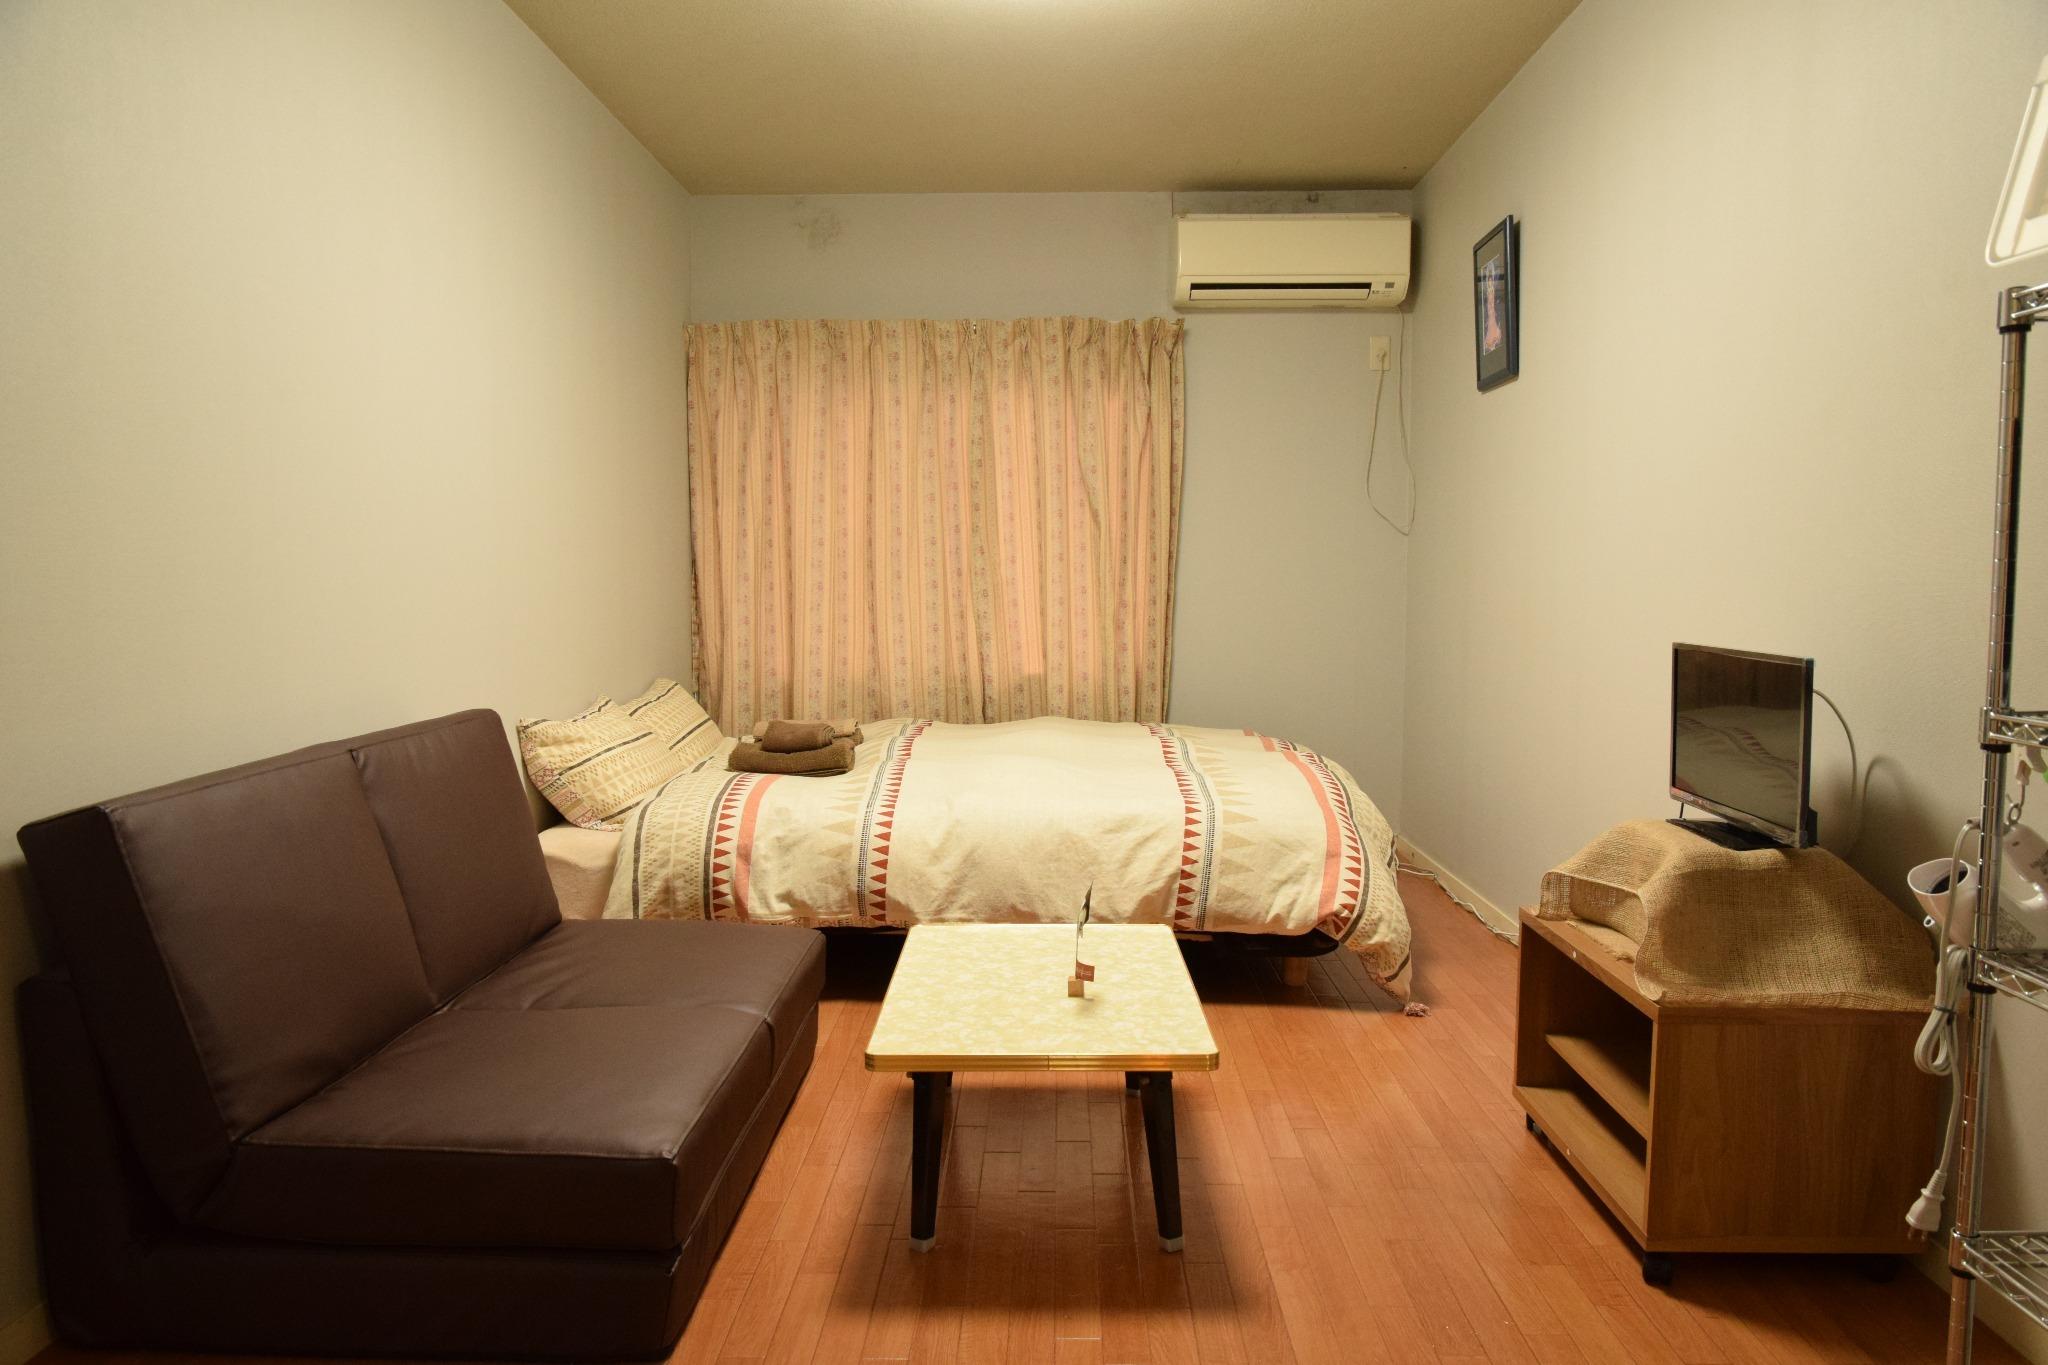 TK0102/三軒茶屋駅徒歩4分/広々1K/Wifi/出張【Vacation STAY提供】